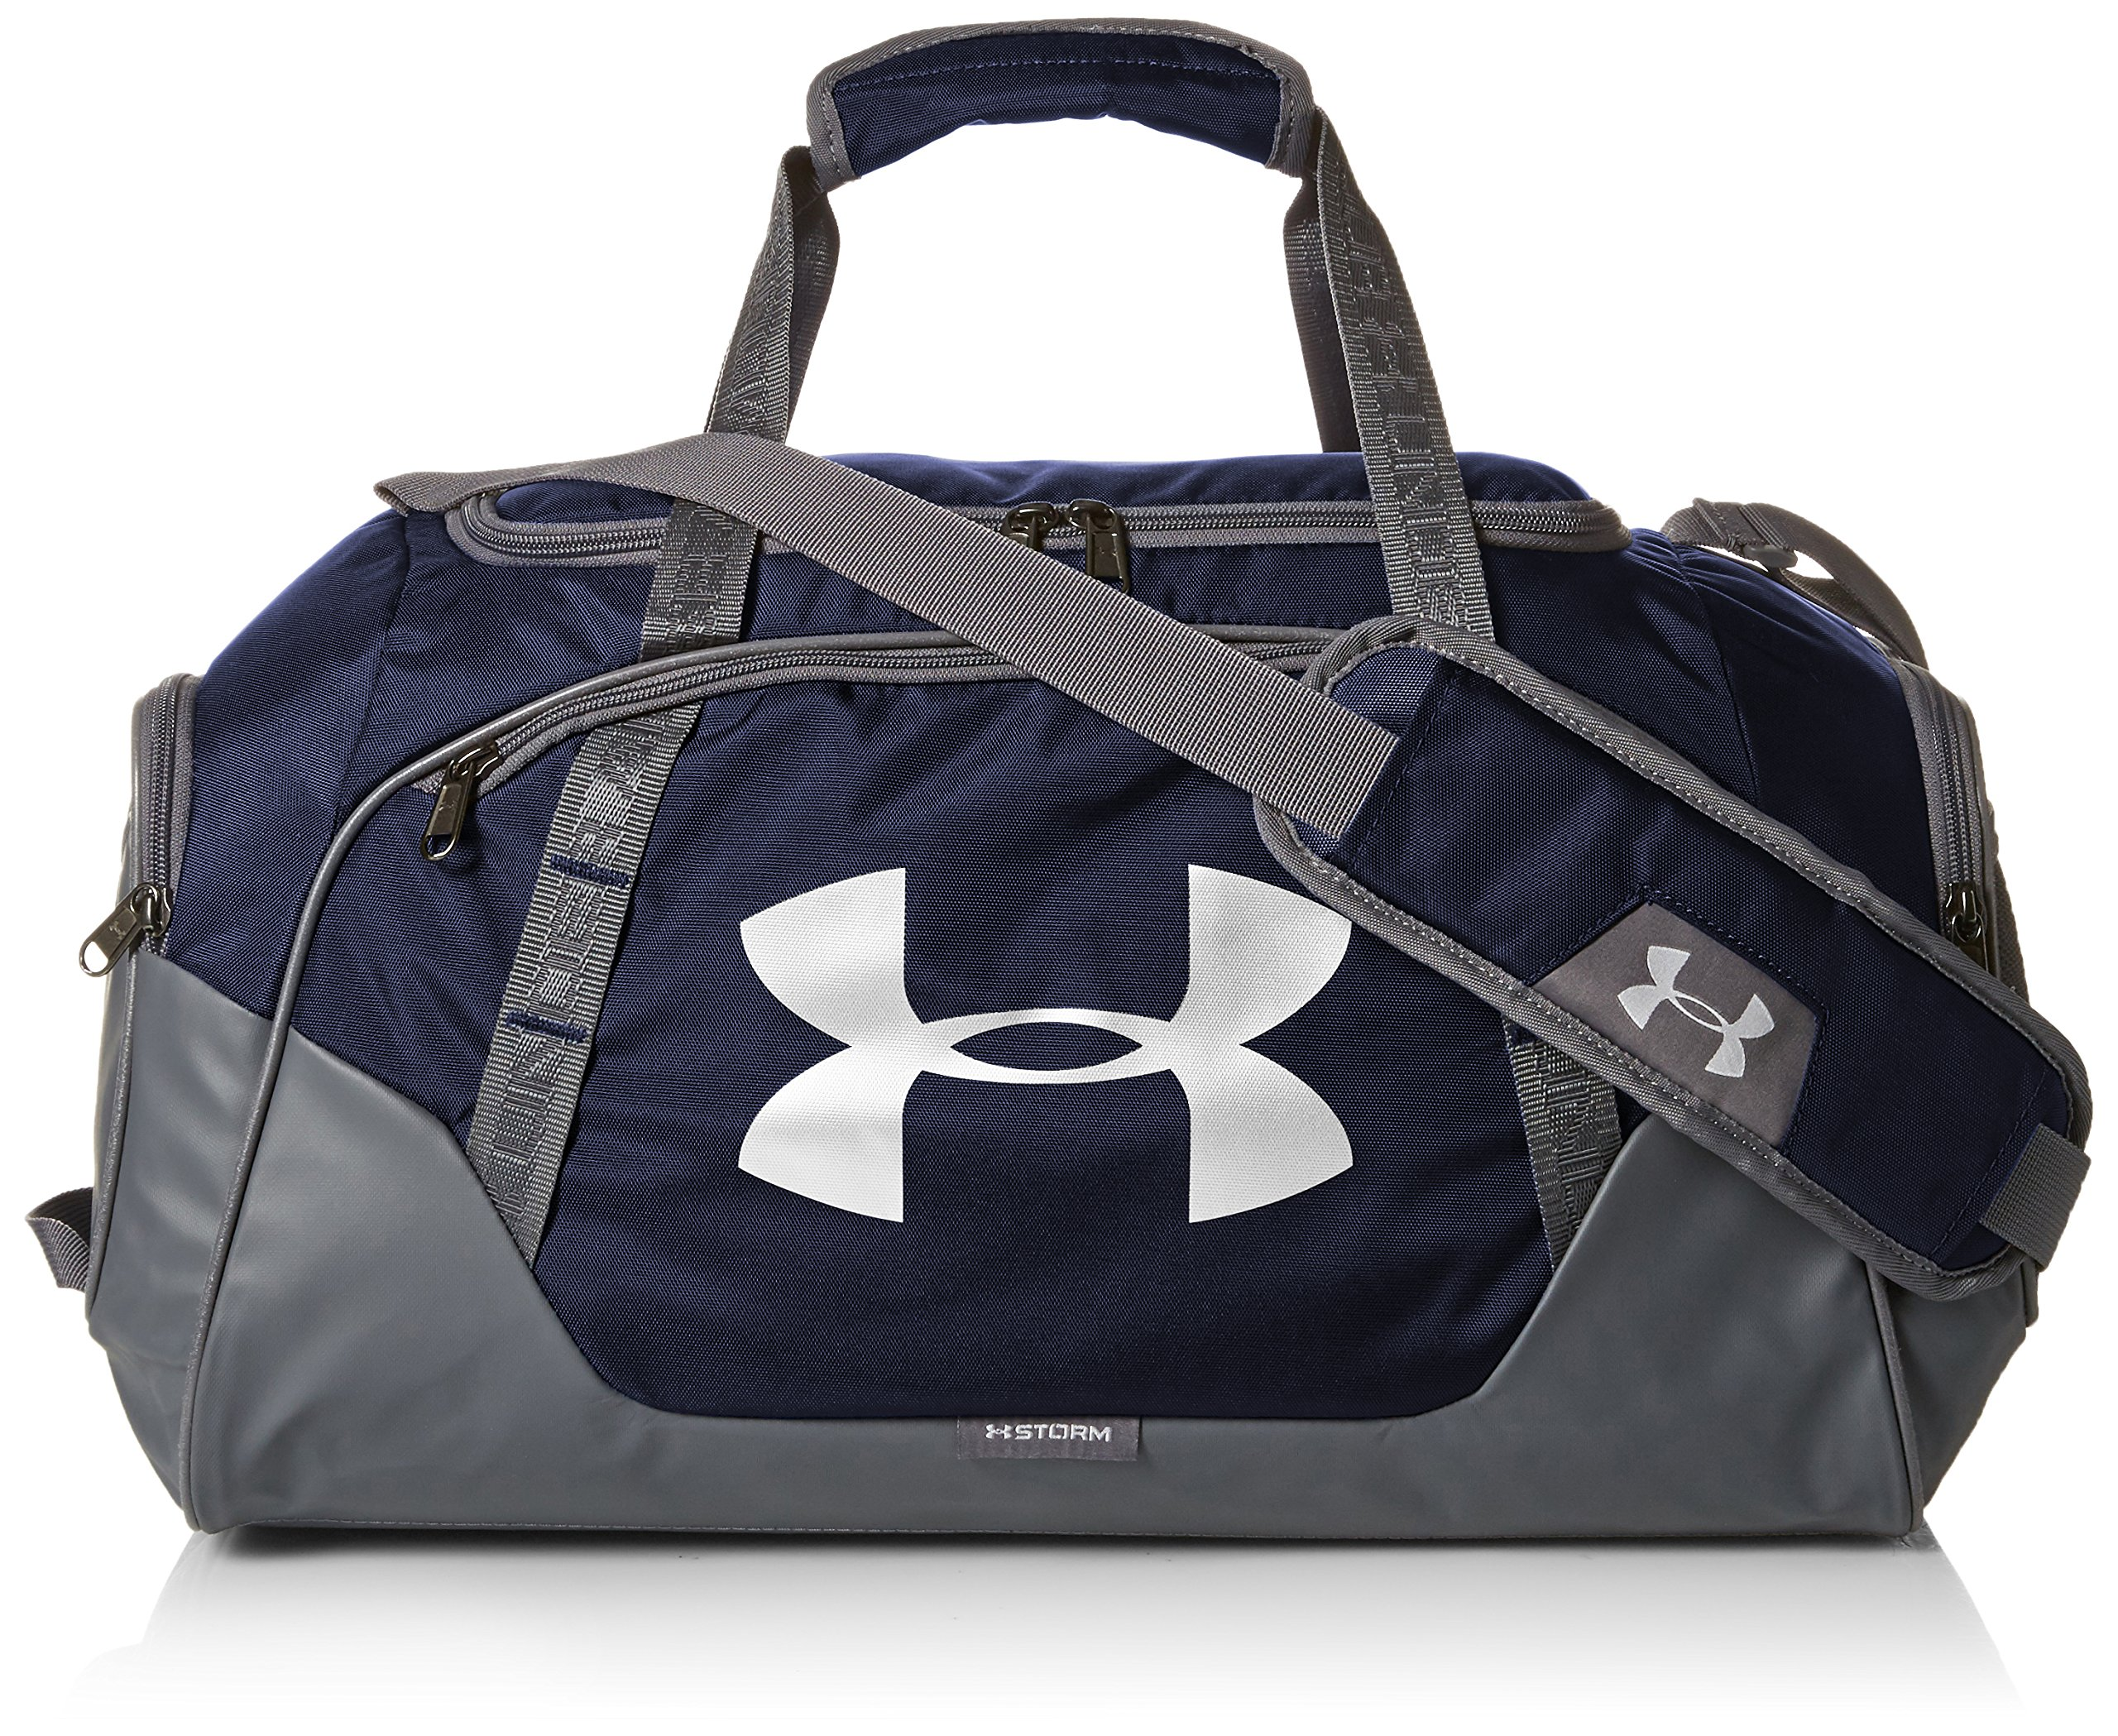 Under Armour Unisex 3.0 innegable Duffel Bag, color azul marino, pequeña